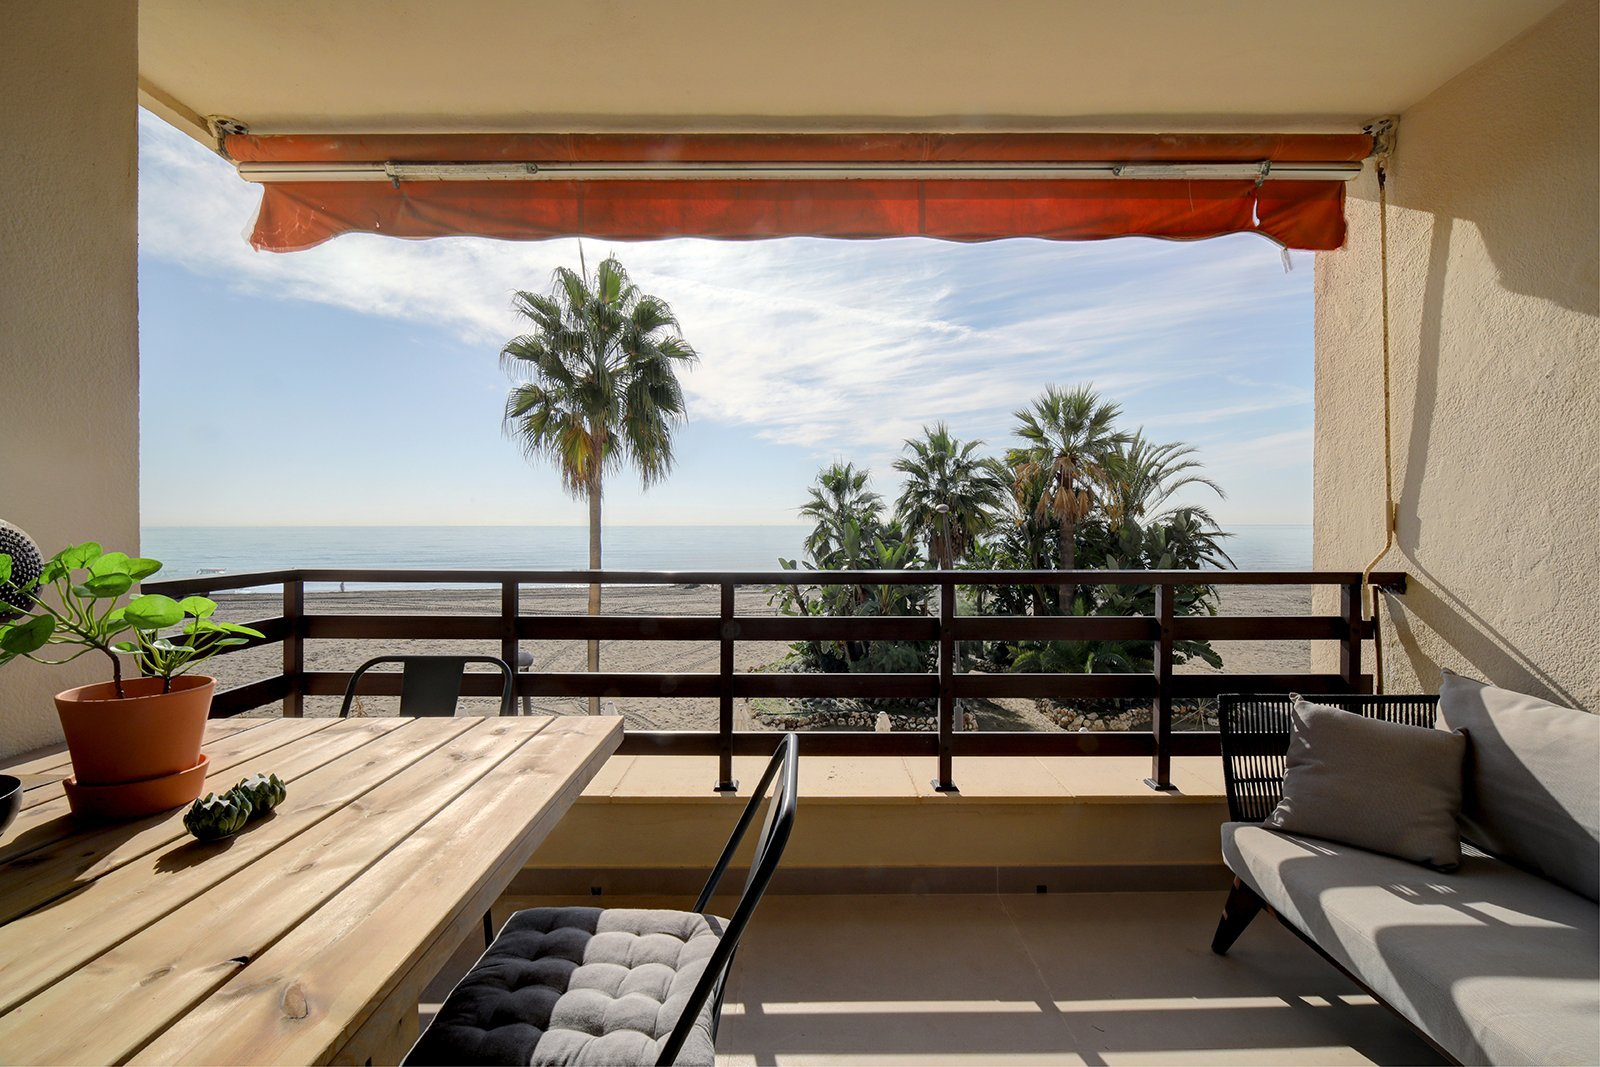 Balkon appt Madrid Estepona